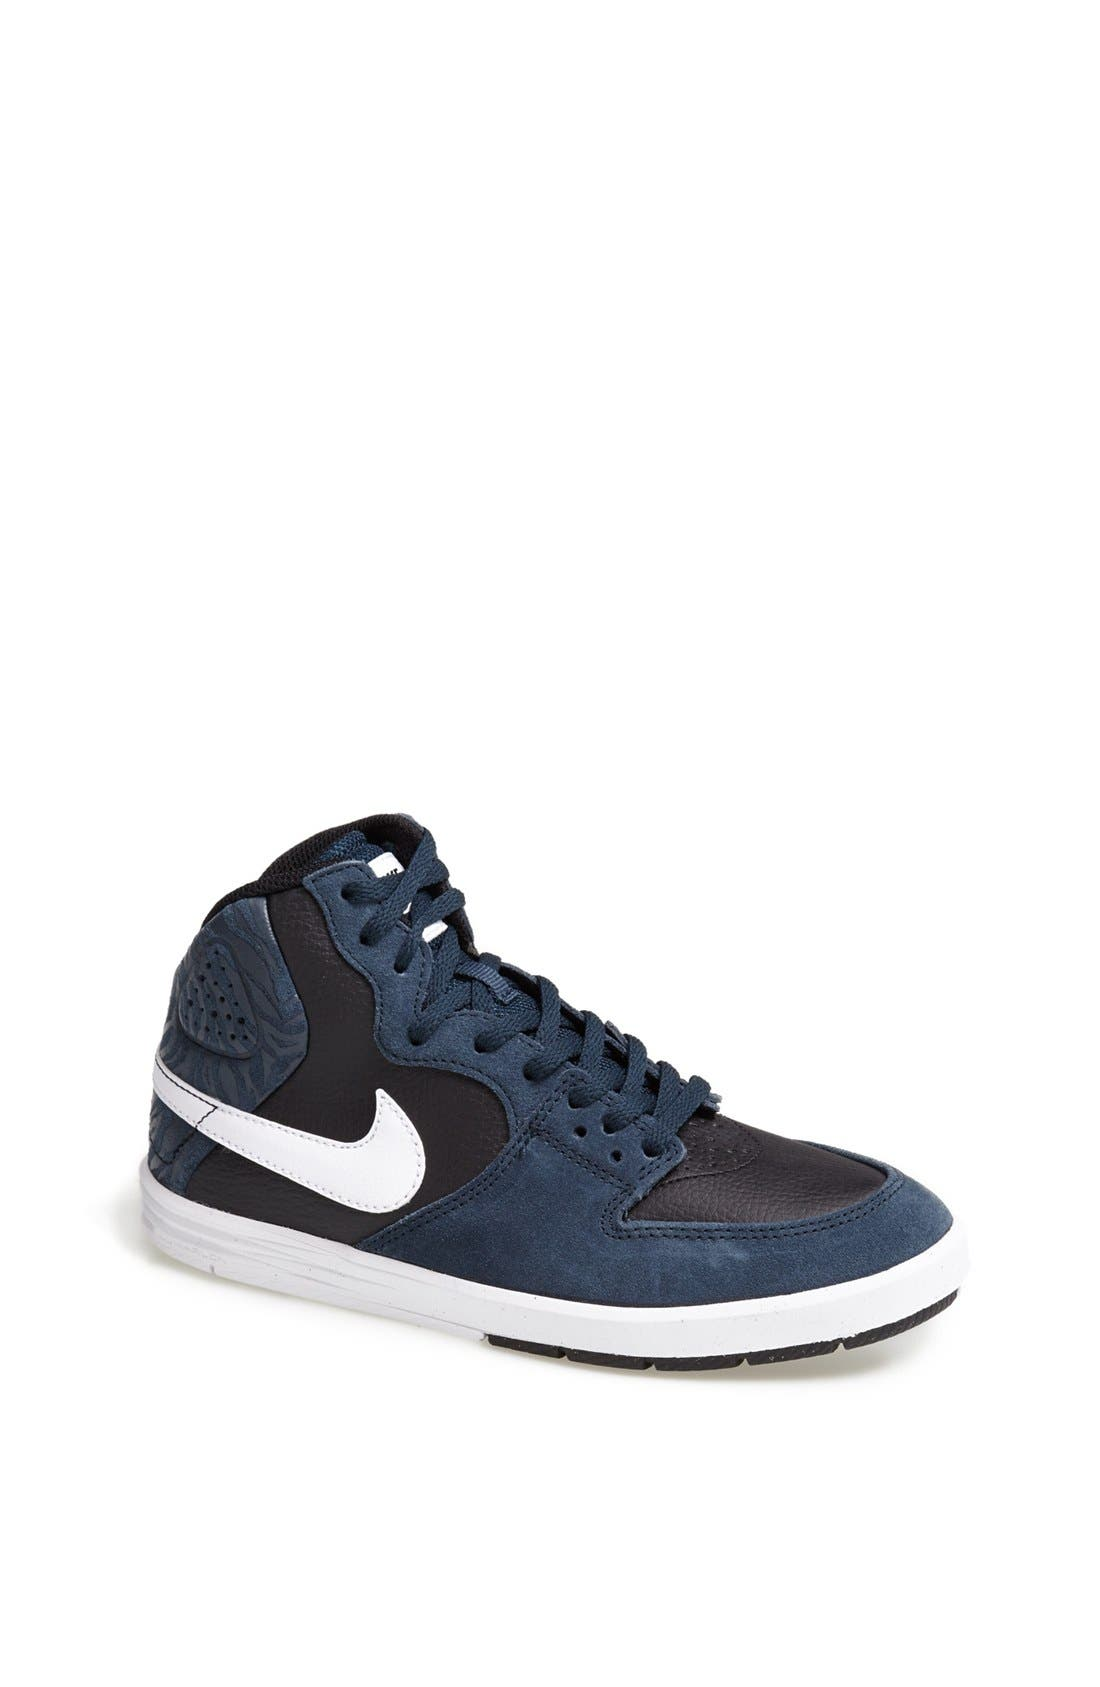 Alternate Image 1 Selected - Nike 'Paul Rodriguez 7' High Top Sneaker (Big Kid)